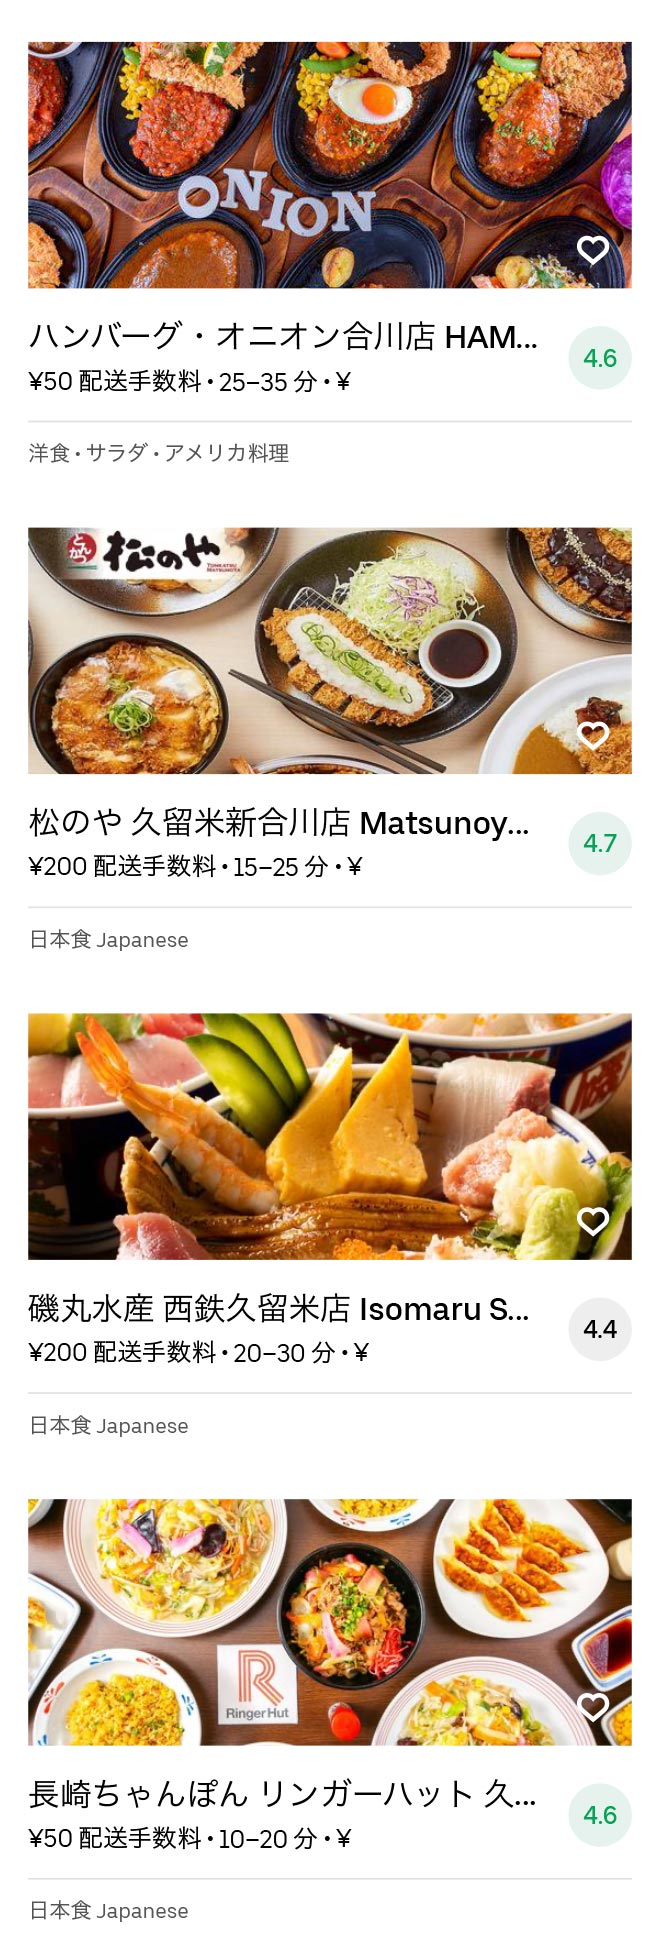 Kurume daigakumae menu 2008 06